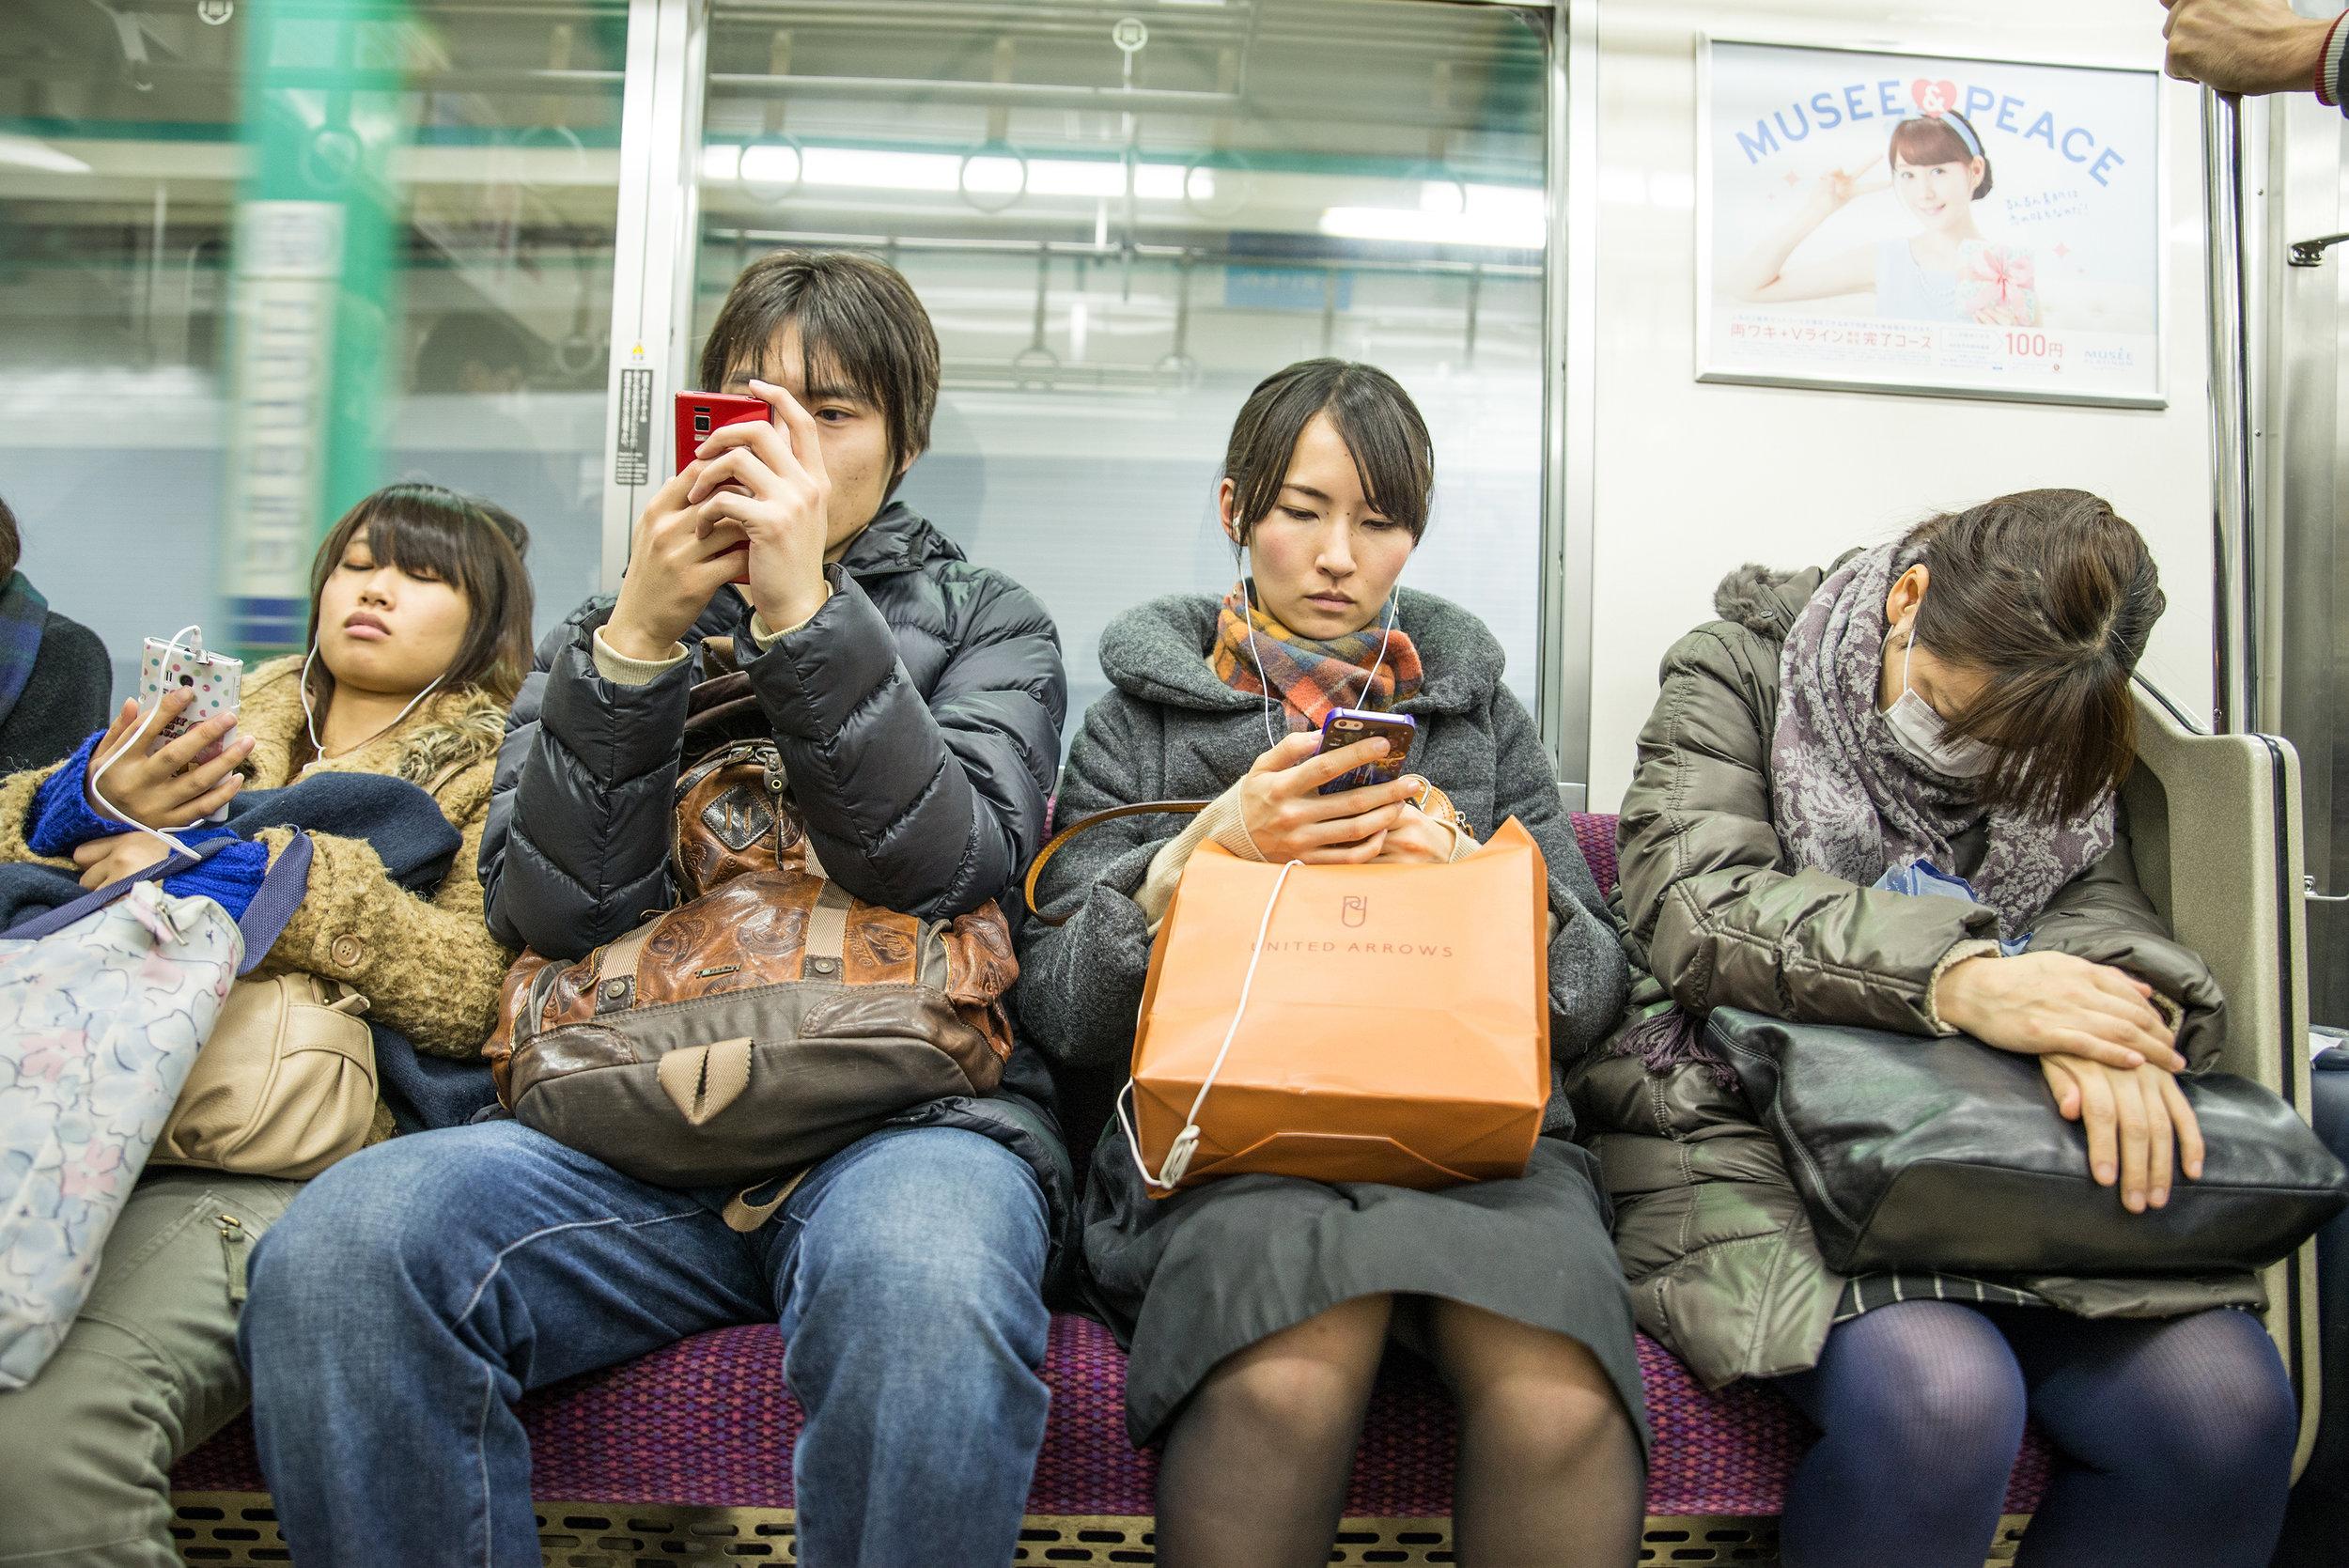 sitting-on-train-in-japan or subway-125dpi.jpg